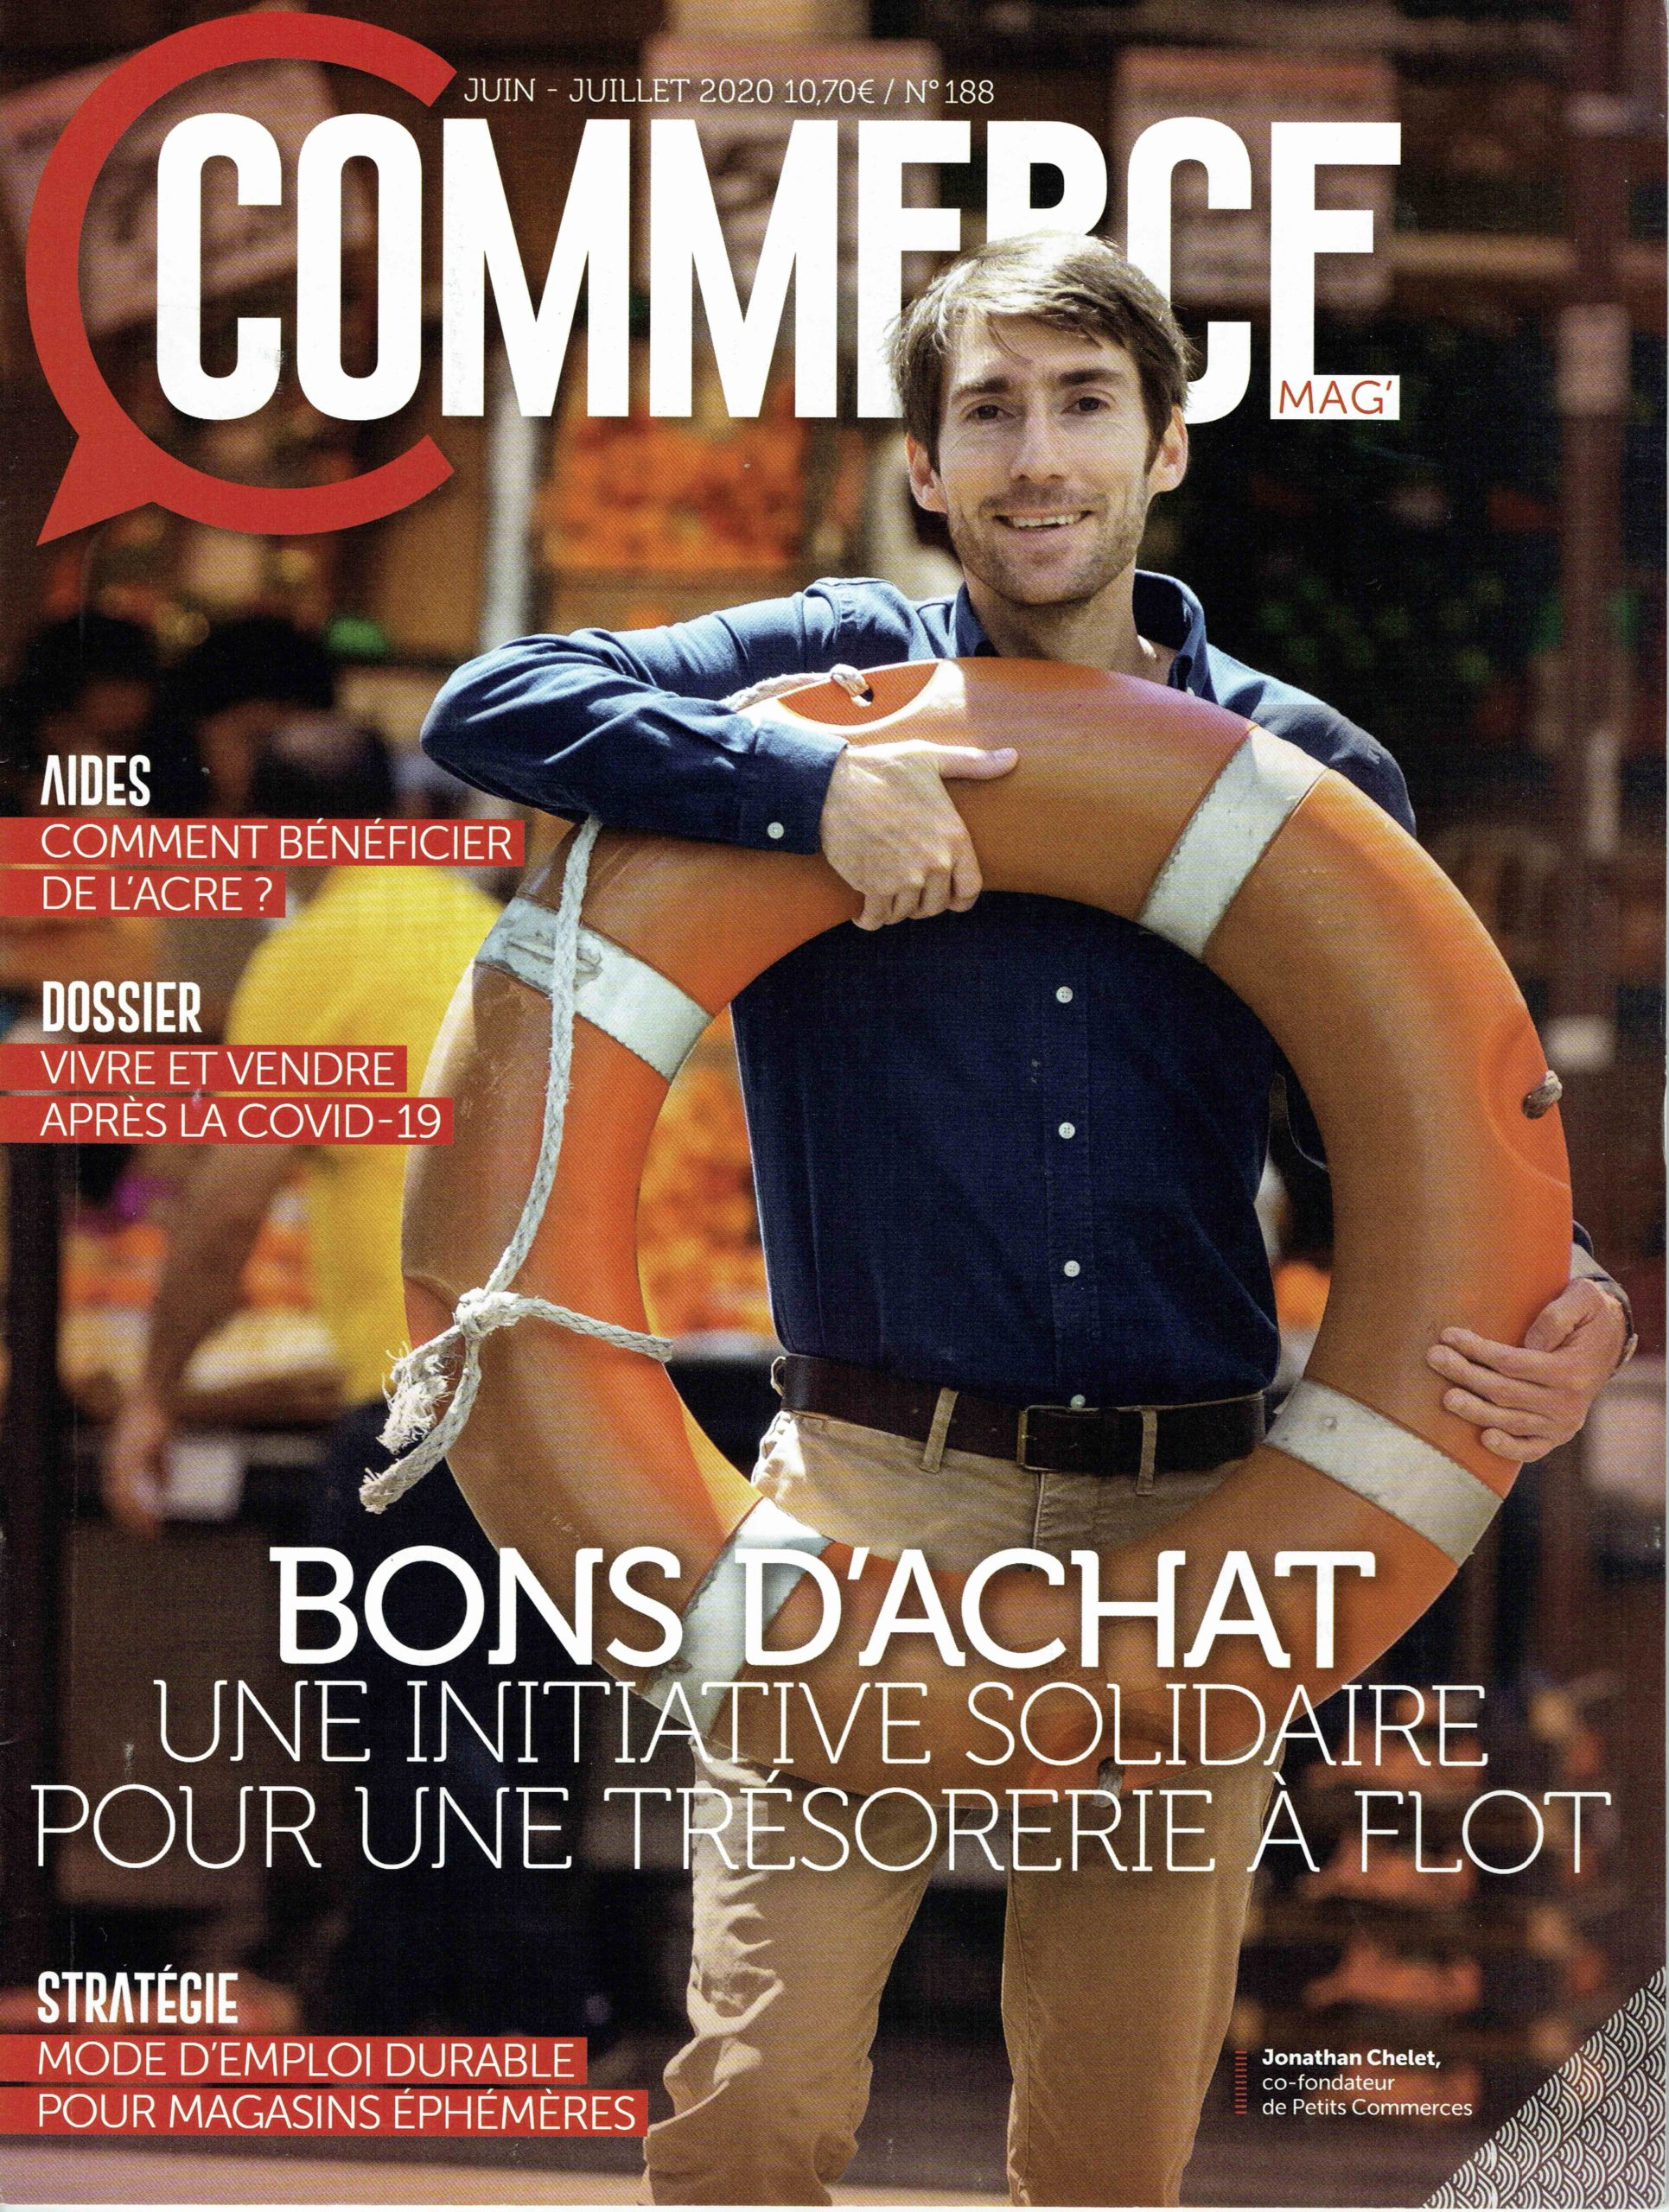 Jonathan Chelet Petitscommerces Couverture Commerce Magazine Petitscommerces.fr